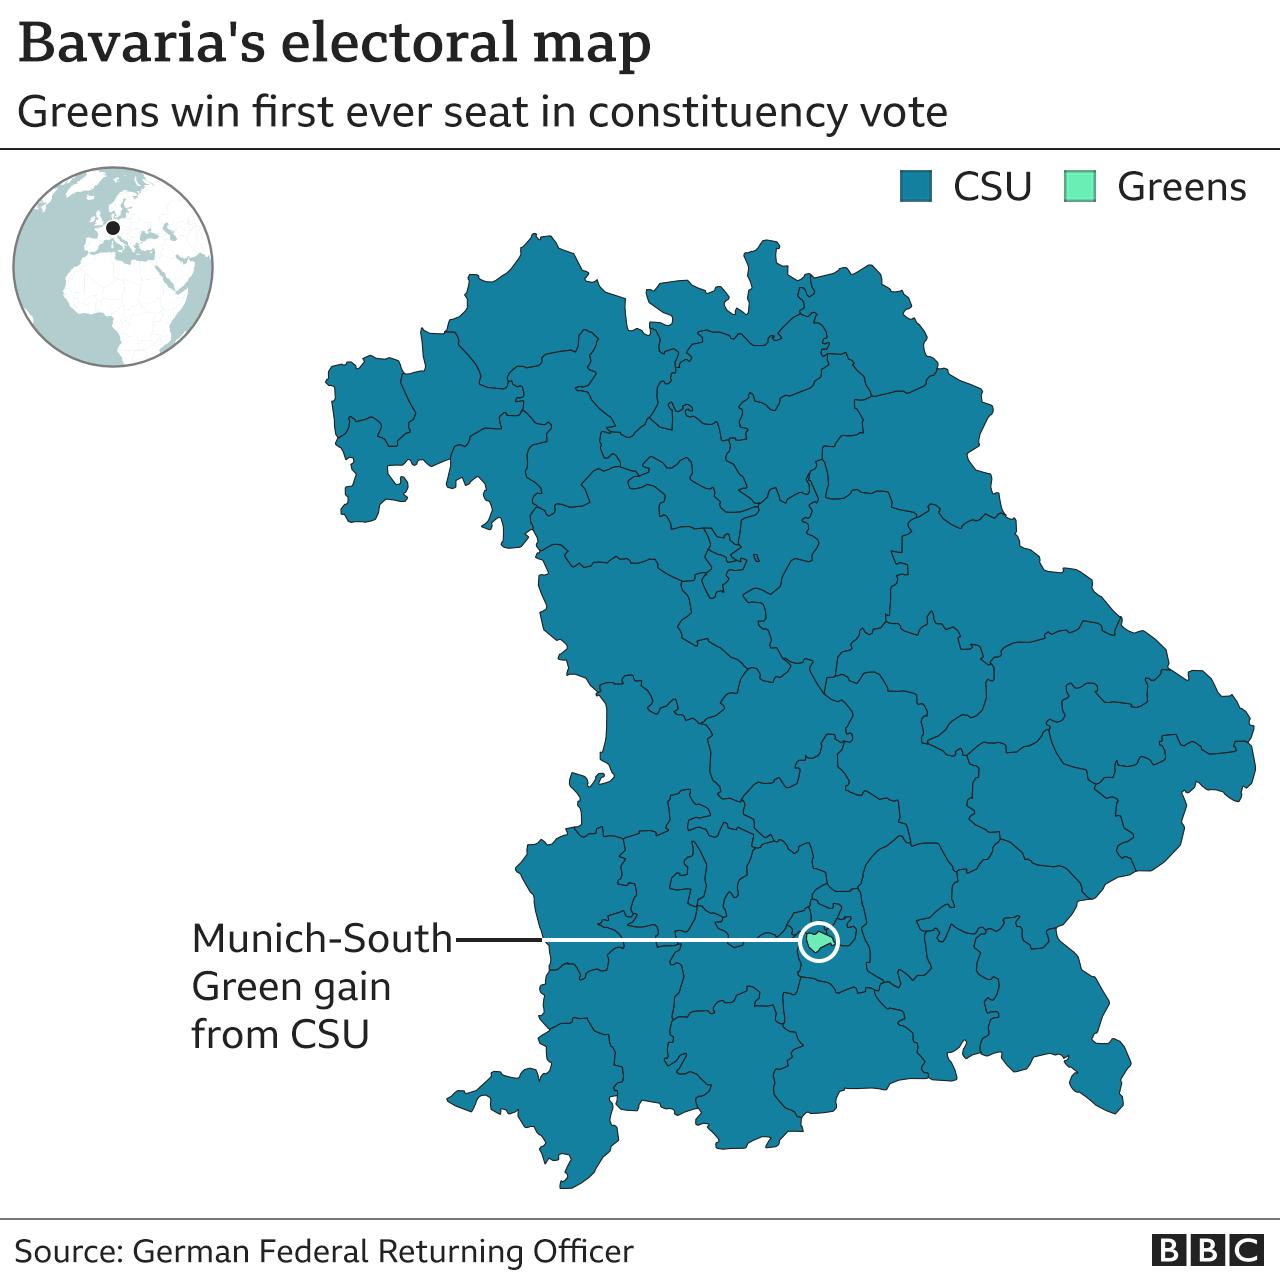 Bavaria's electoral map